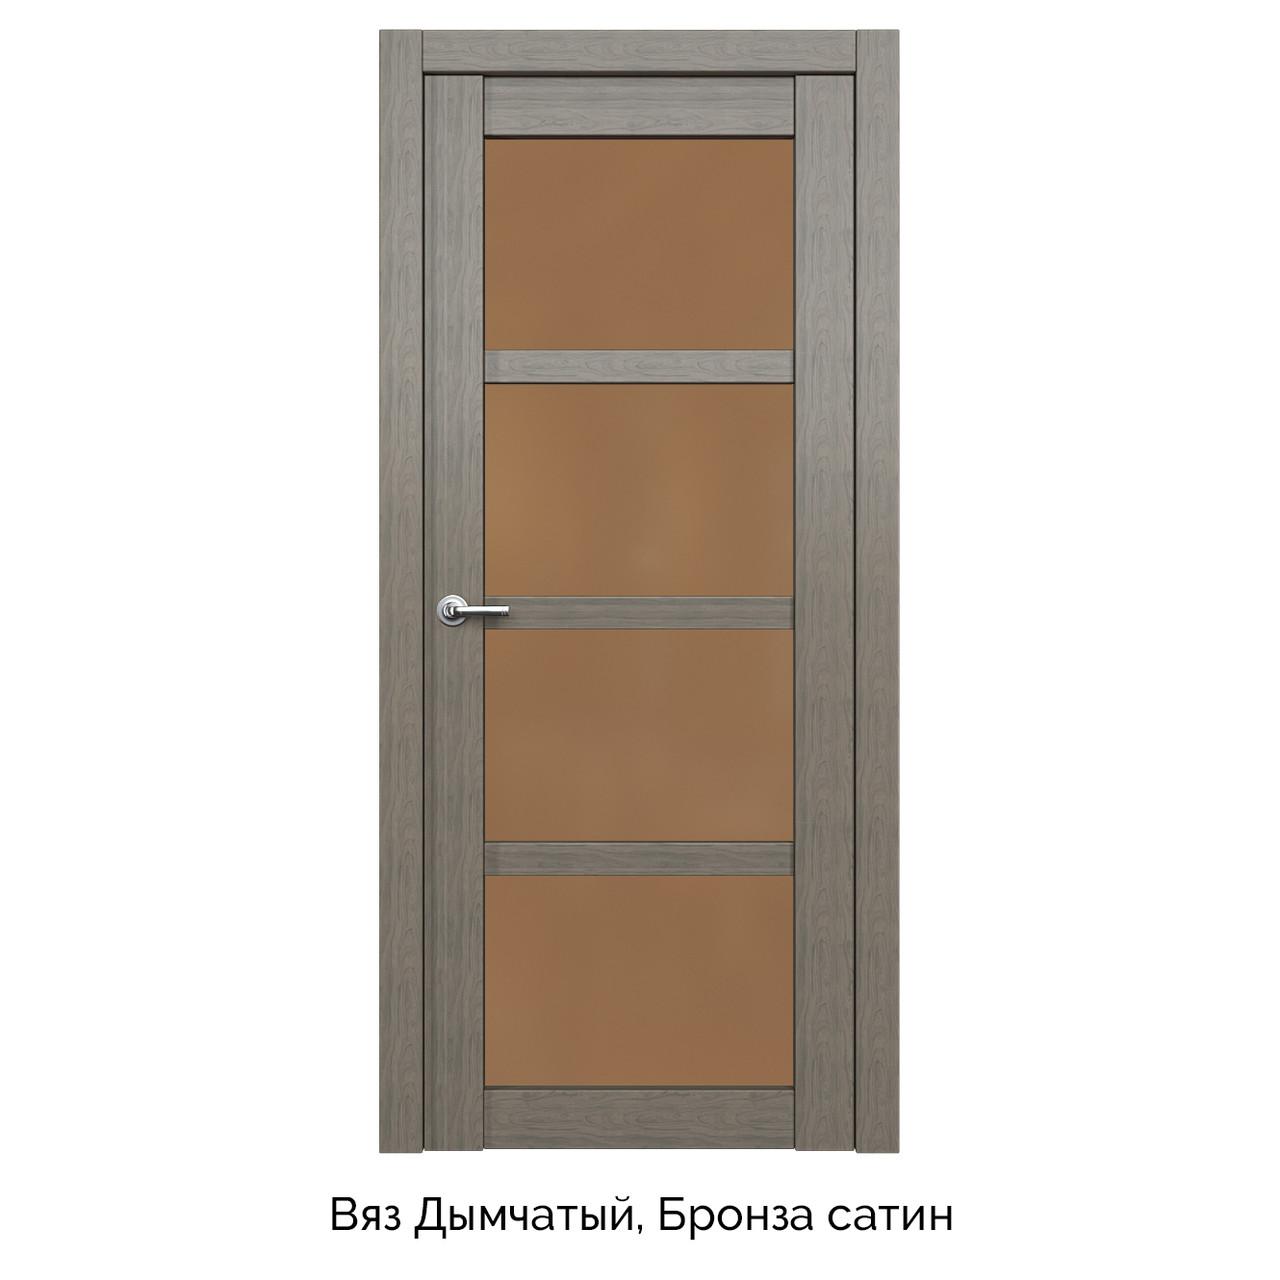 "Дверь межкомнатная ""Vegas 2"" - фото 5"